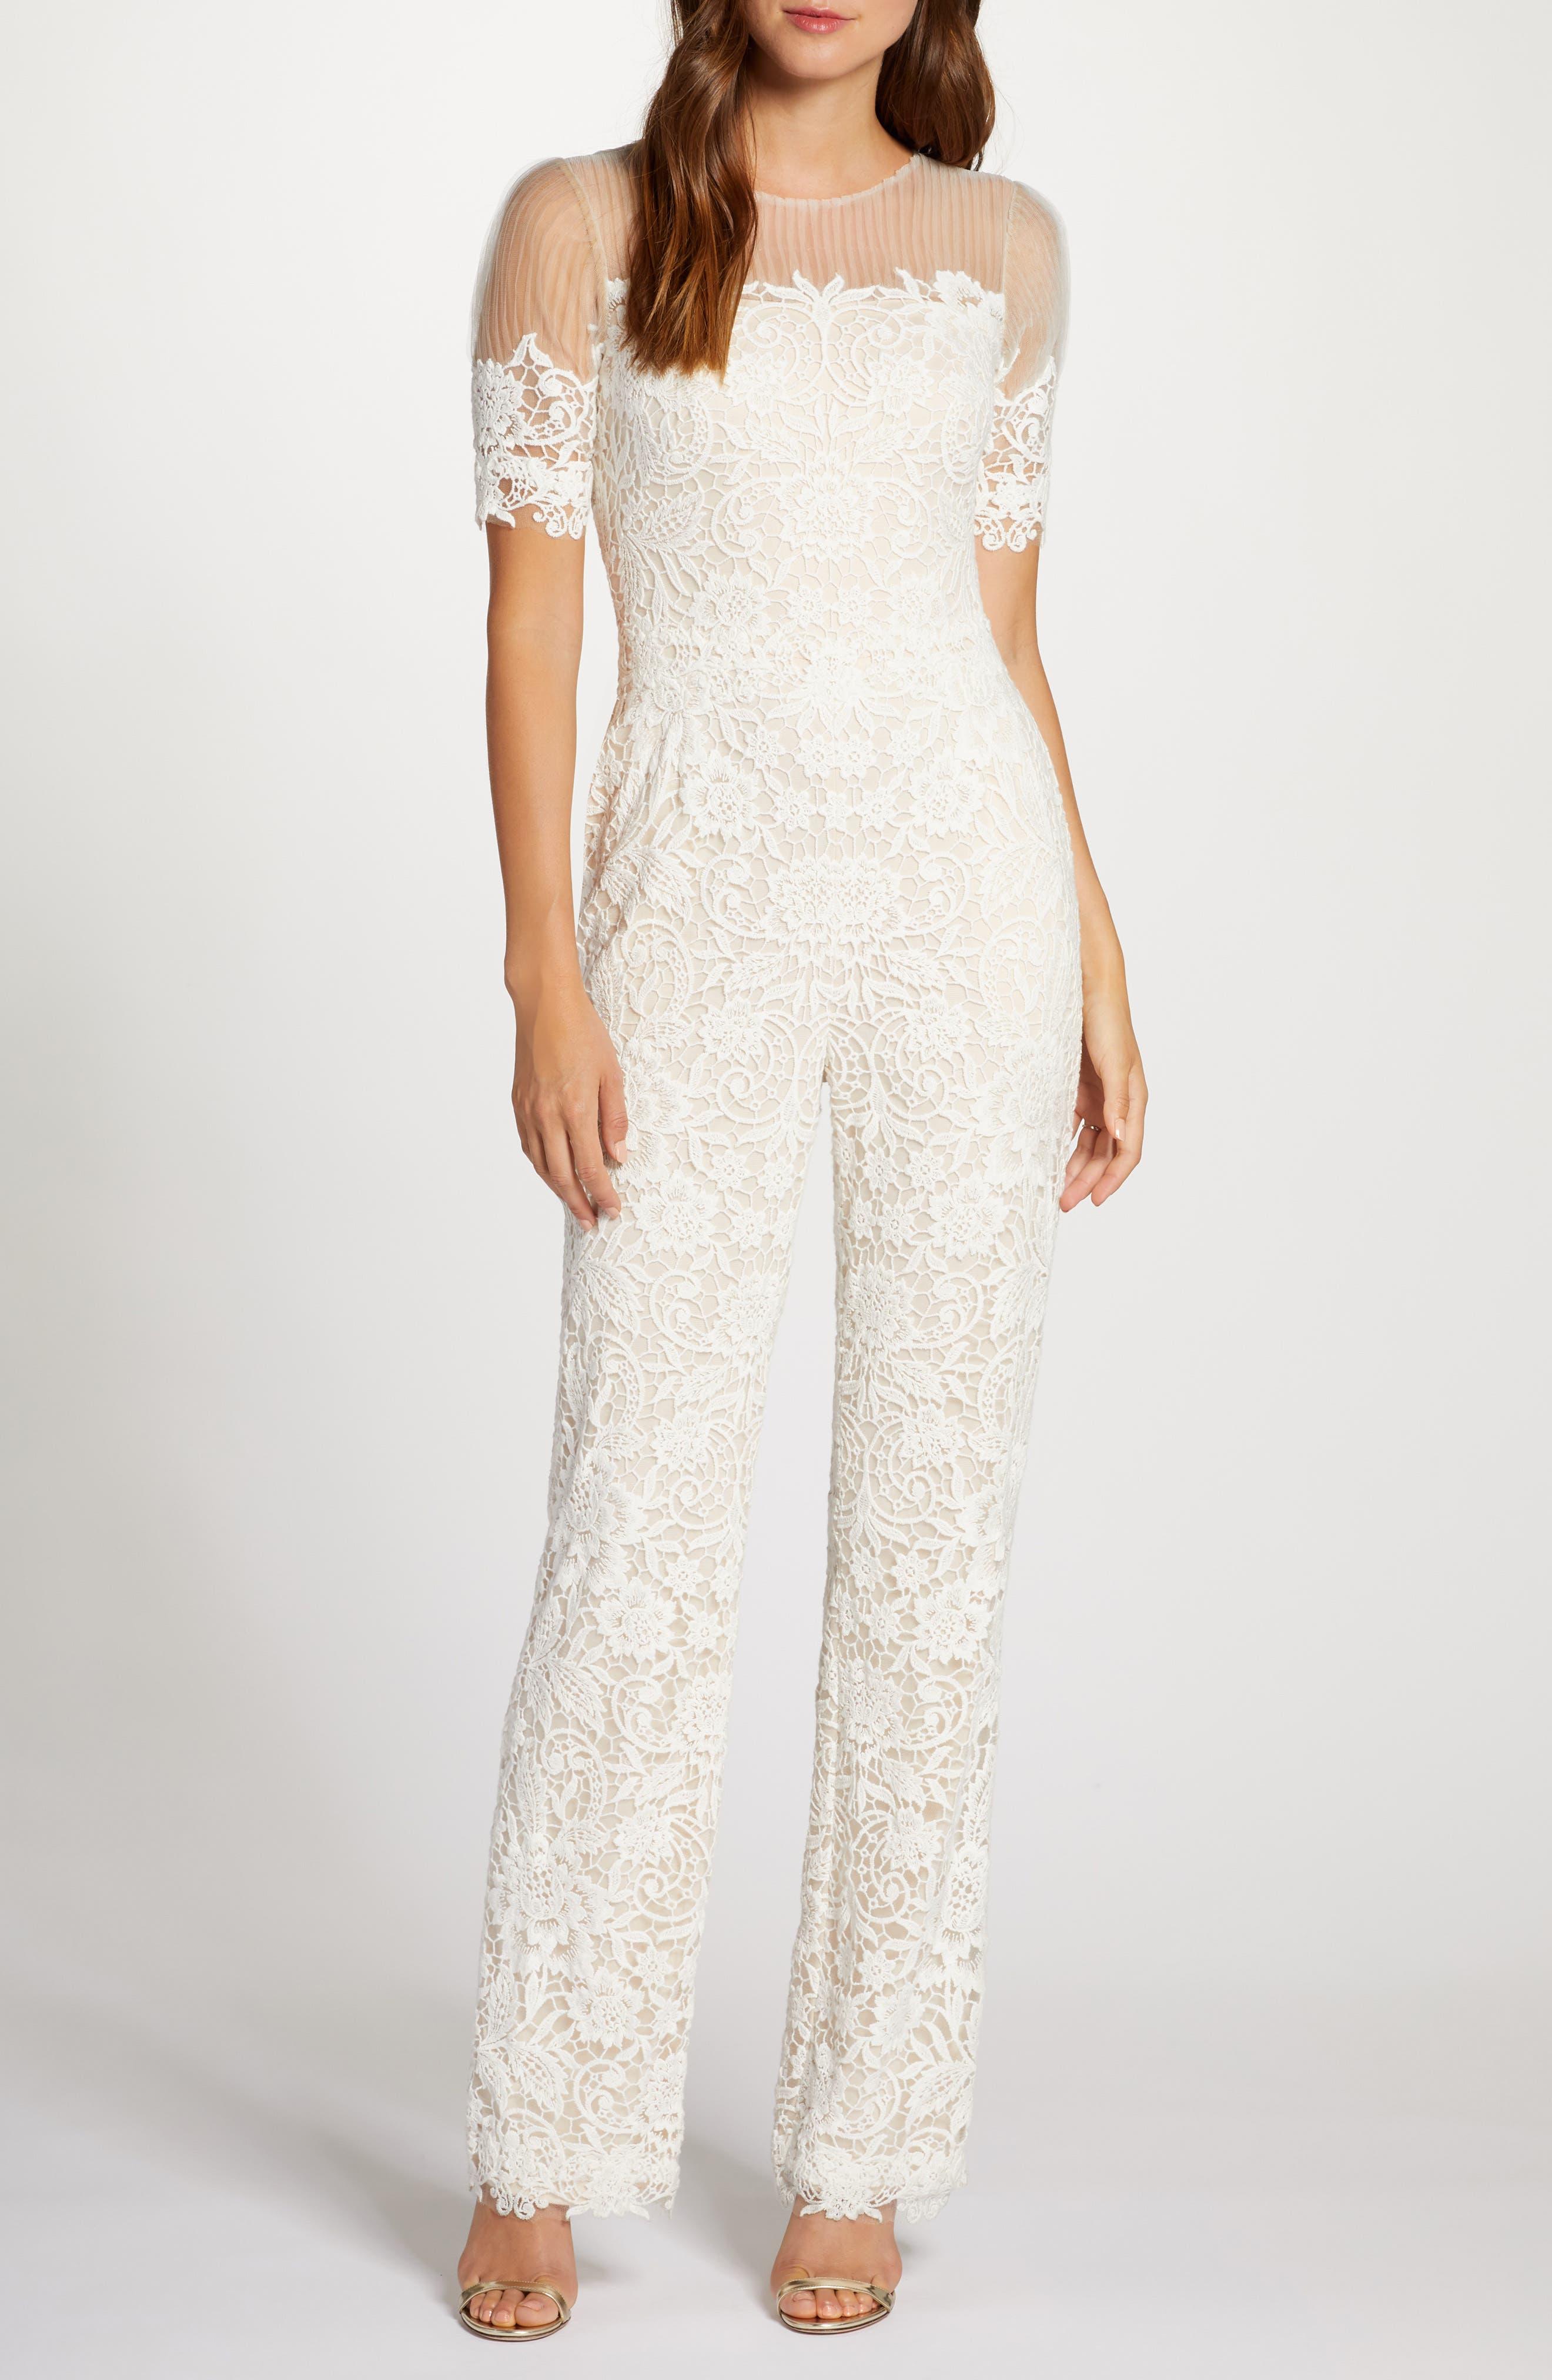 60s Wedding Dresses | 70s Wedding Dresses Womens Tadashi Shoji Lace Straight Leg Wedding Jumpsuit $828.00 AT vintagedancer.com